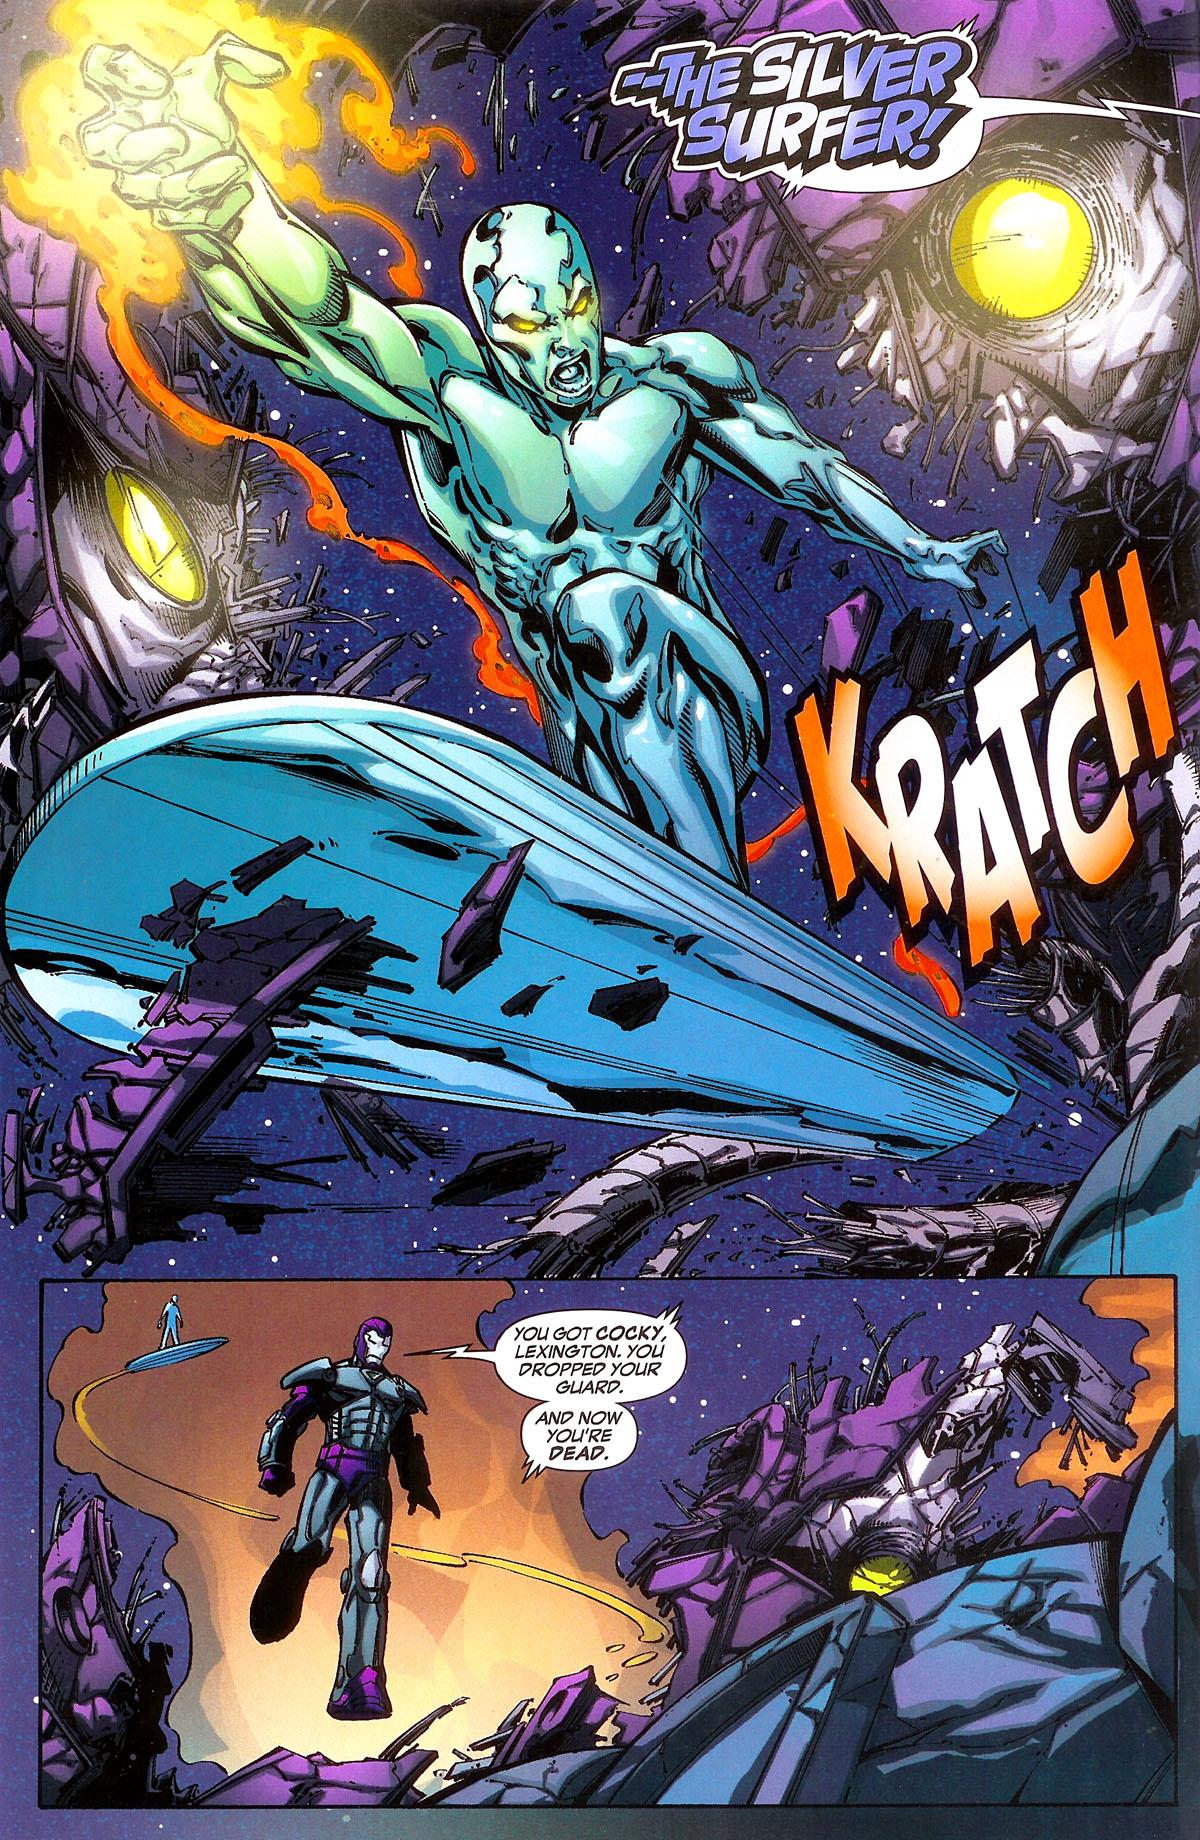 Read online Sentinel Squad O*N*E comic -  Issue #2 - 6